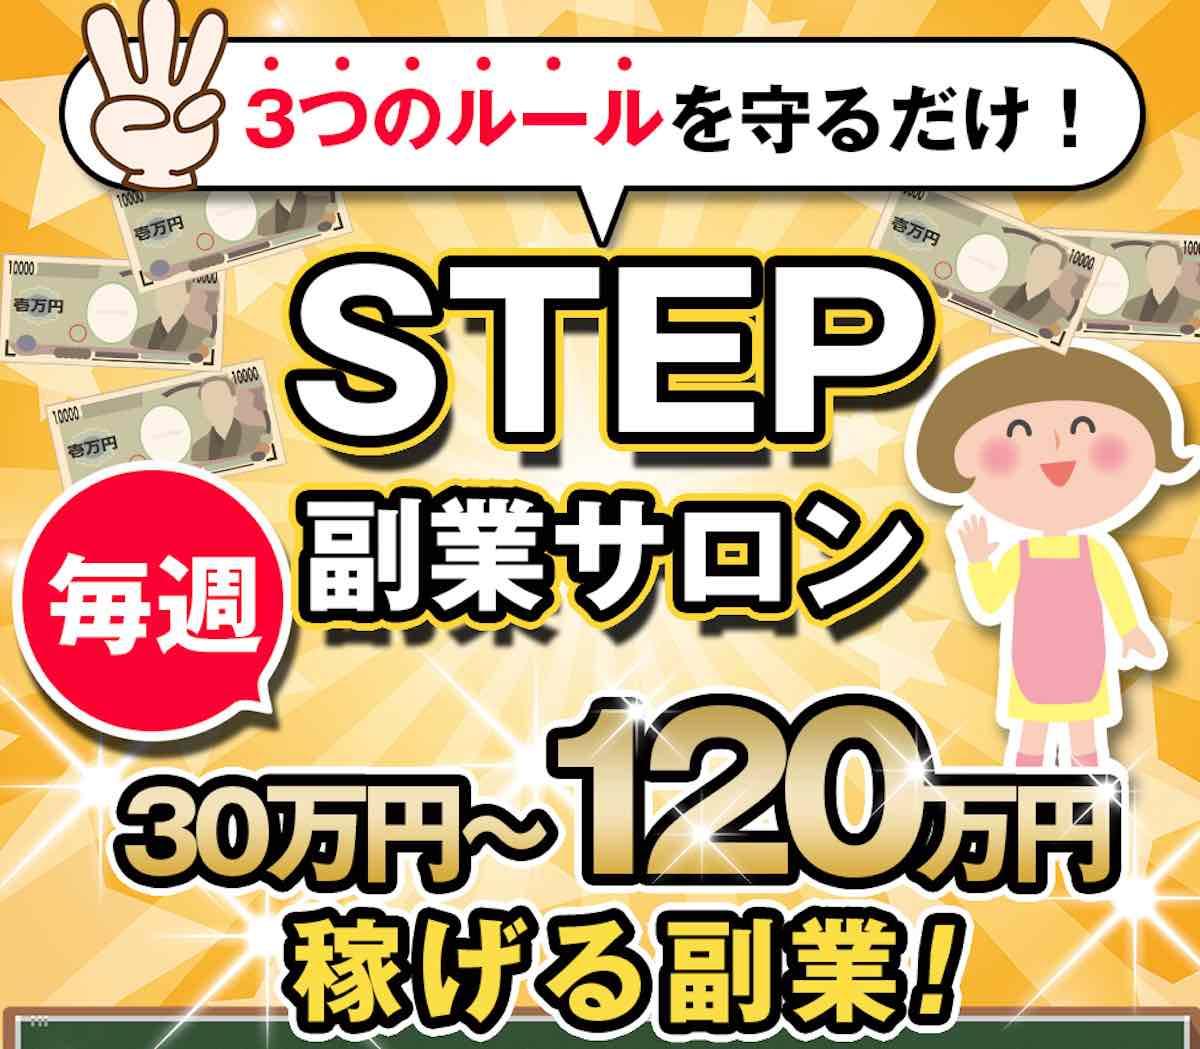 STEP(ステップ)副業は怪しい競馬投資詐欺!?深田優子の正体とは?毎週30万円は稼げるのか口コミ評判徹底レビュー